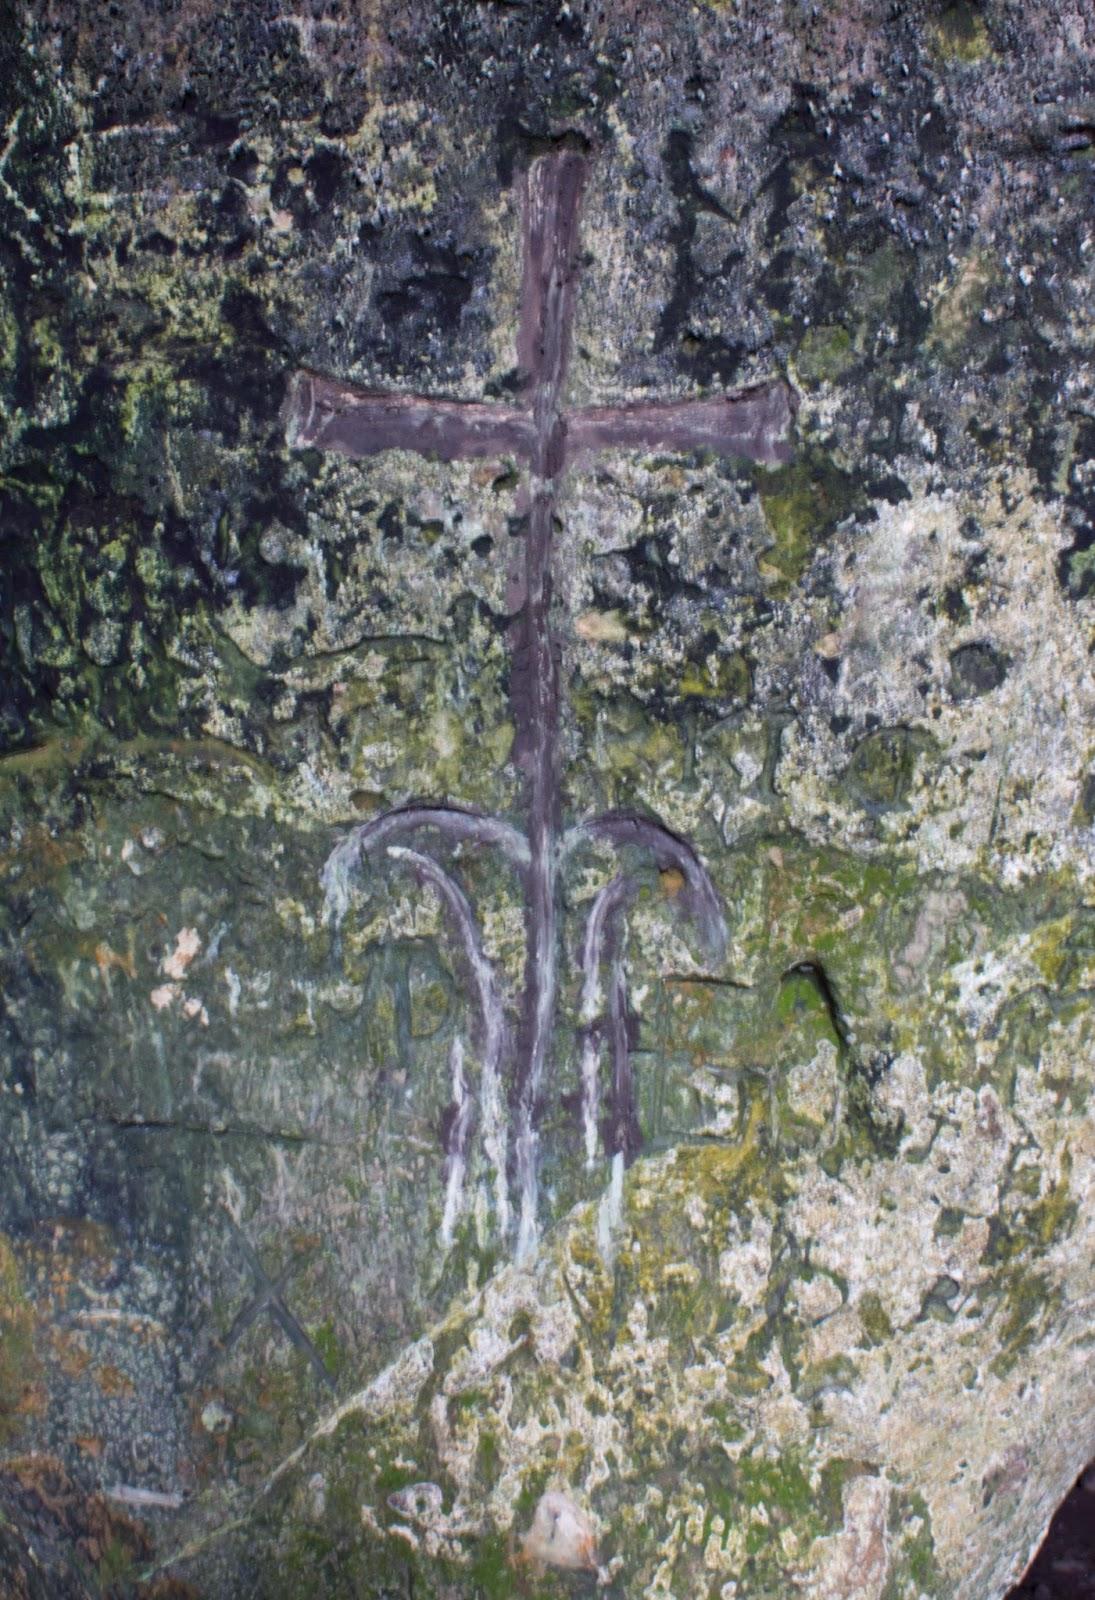 Man Cave Kings Cross : Arran in focus photography kings cave isle of